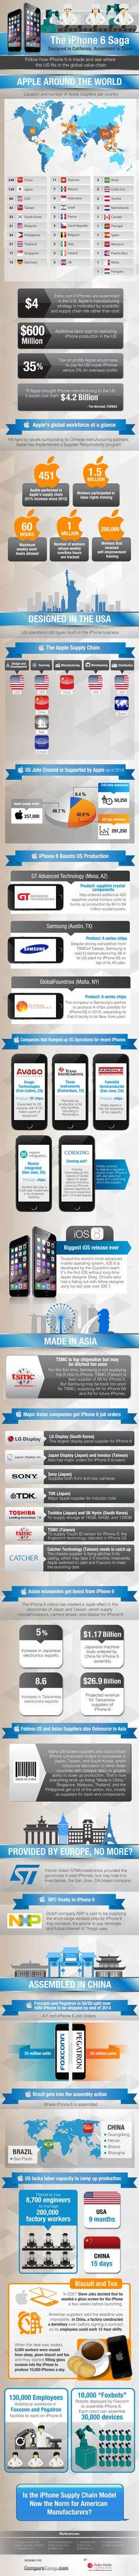 iphone manufacturing process